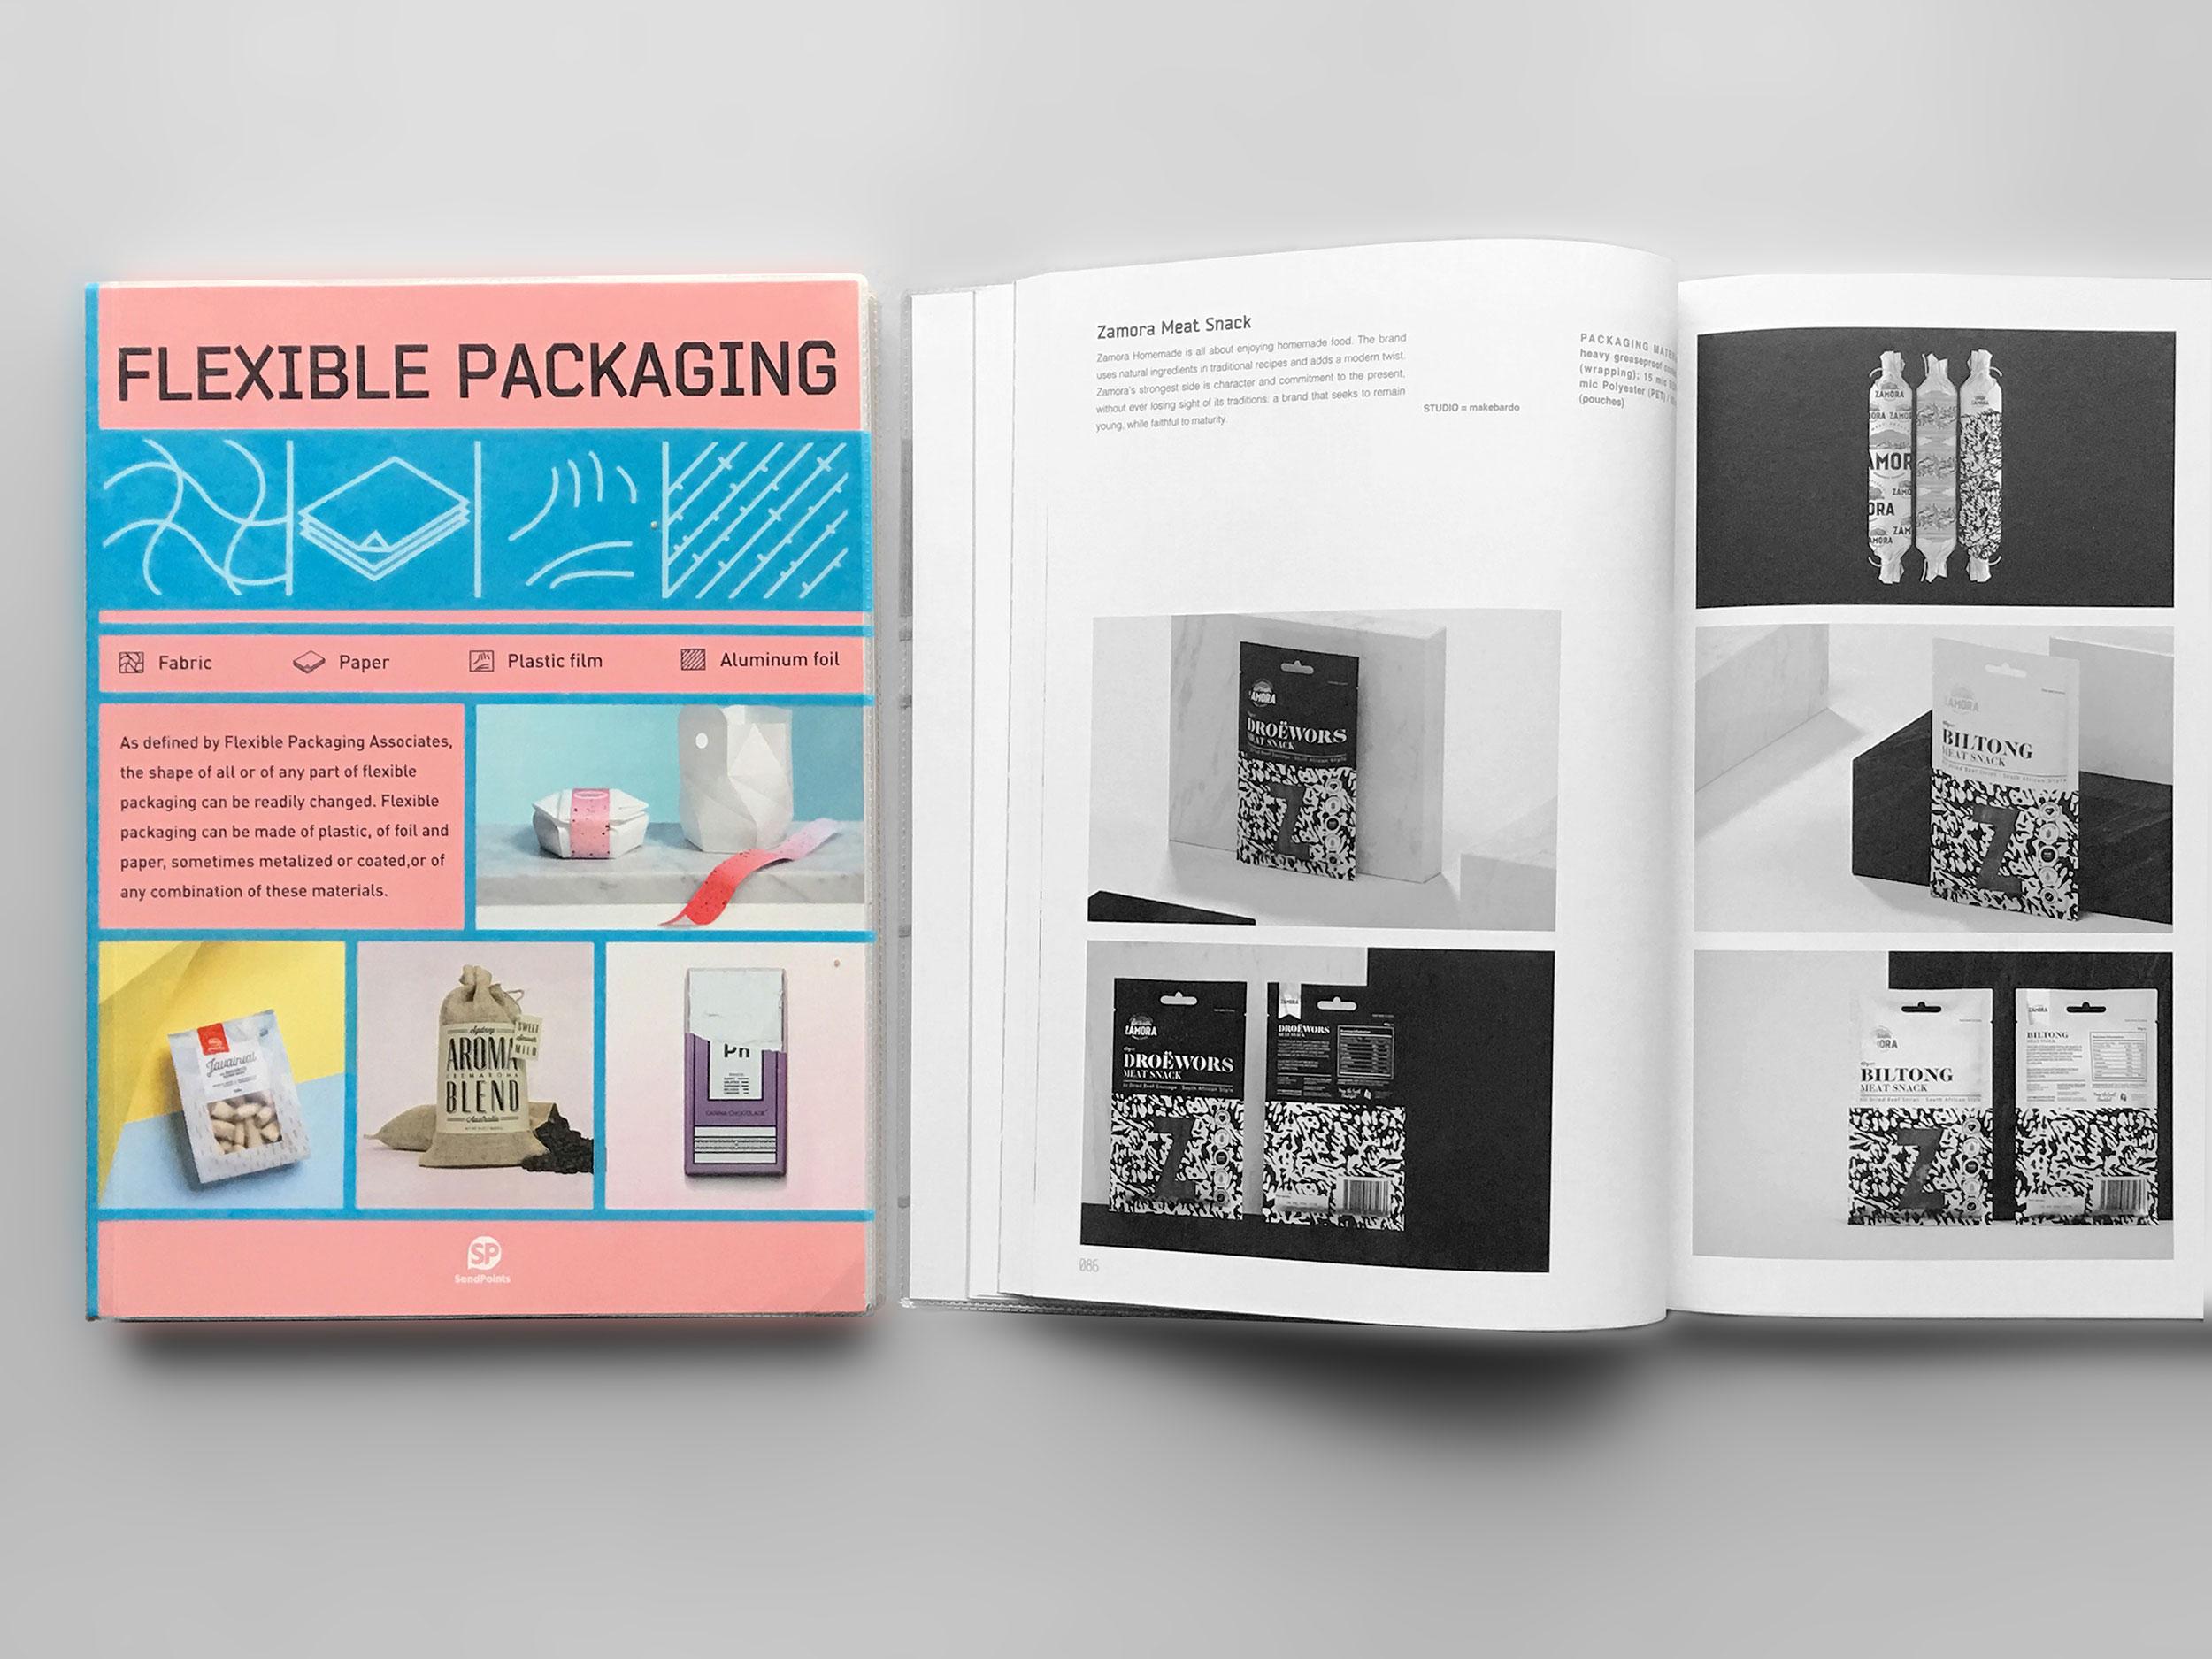 makebardo_Flexible_Packaging.jpg